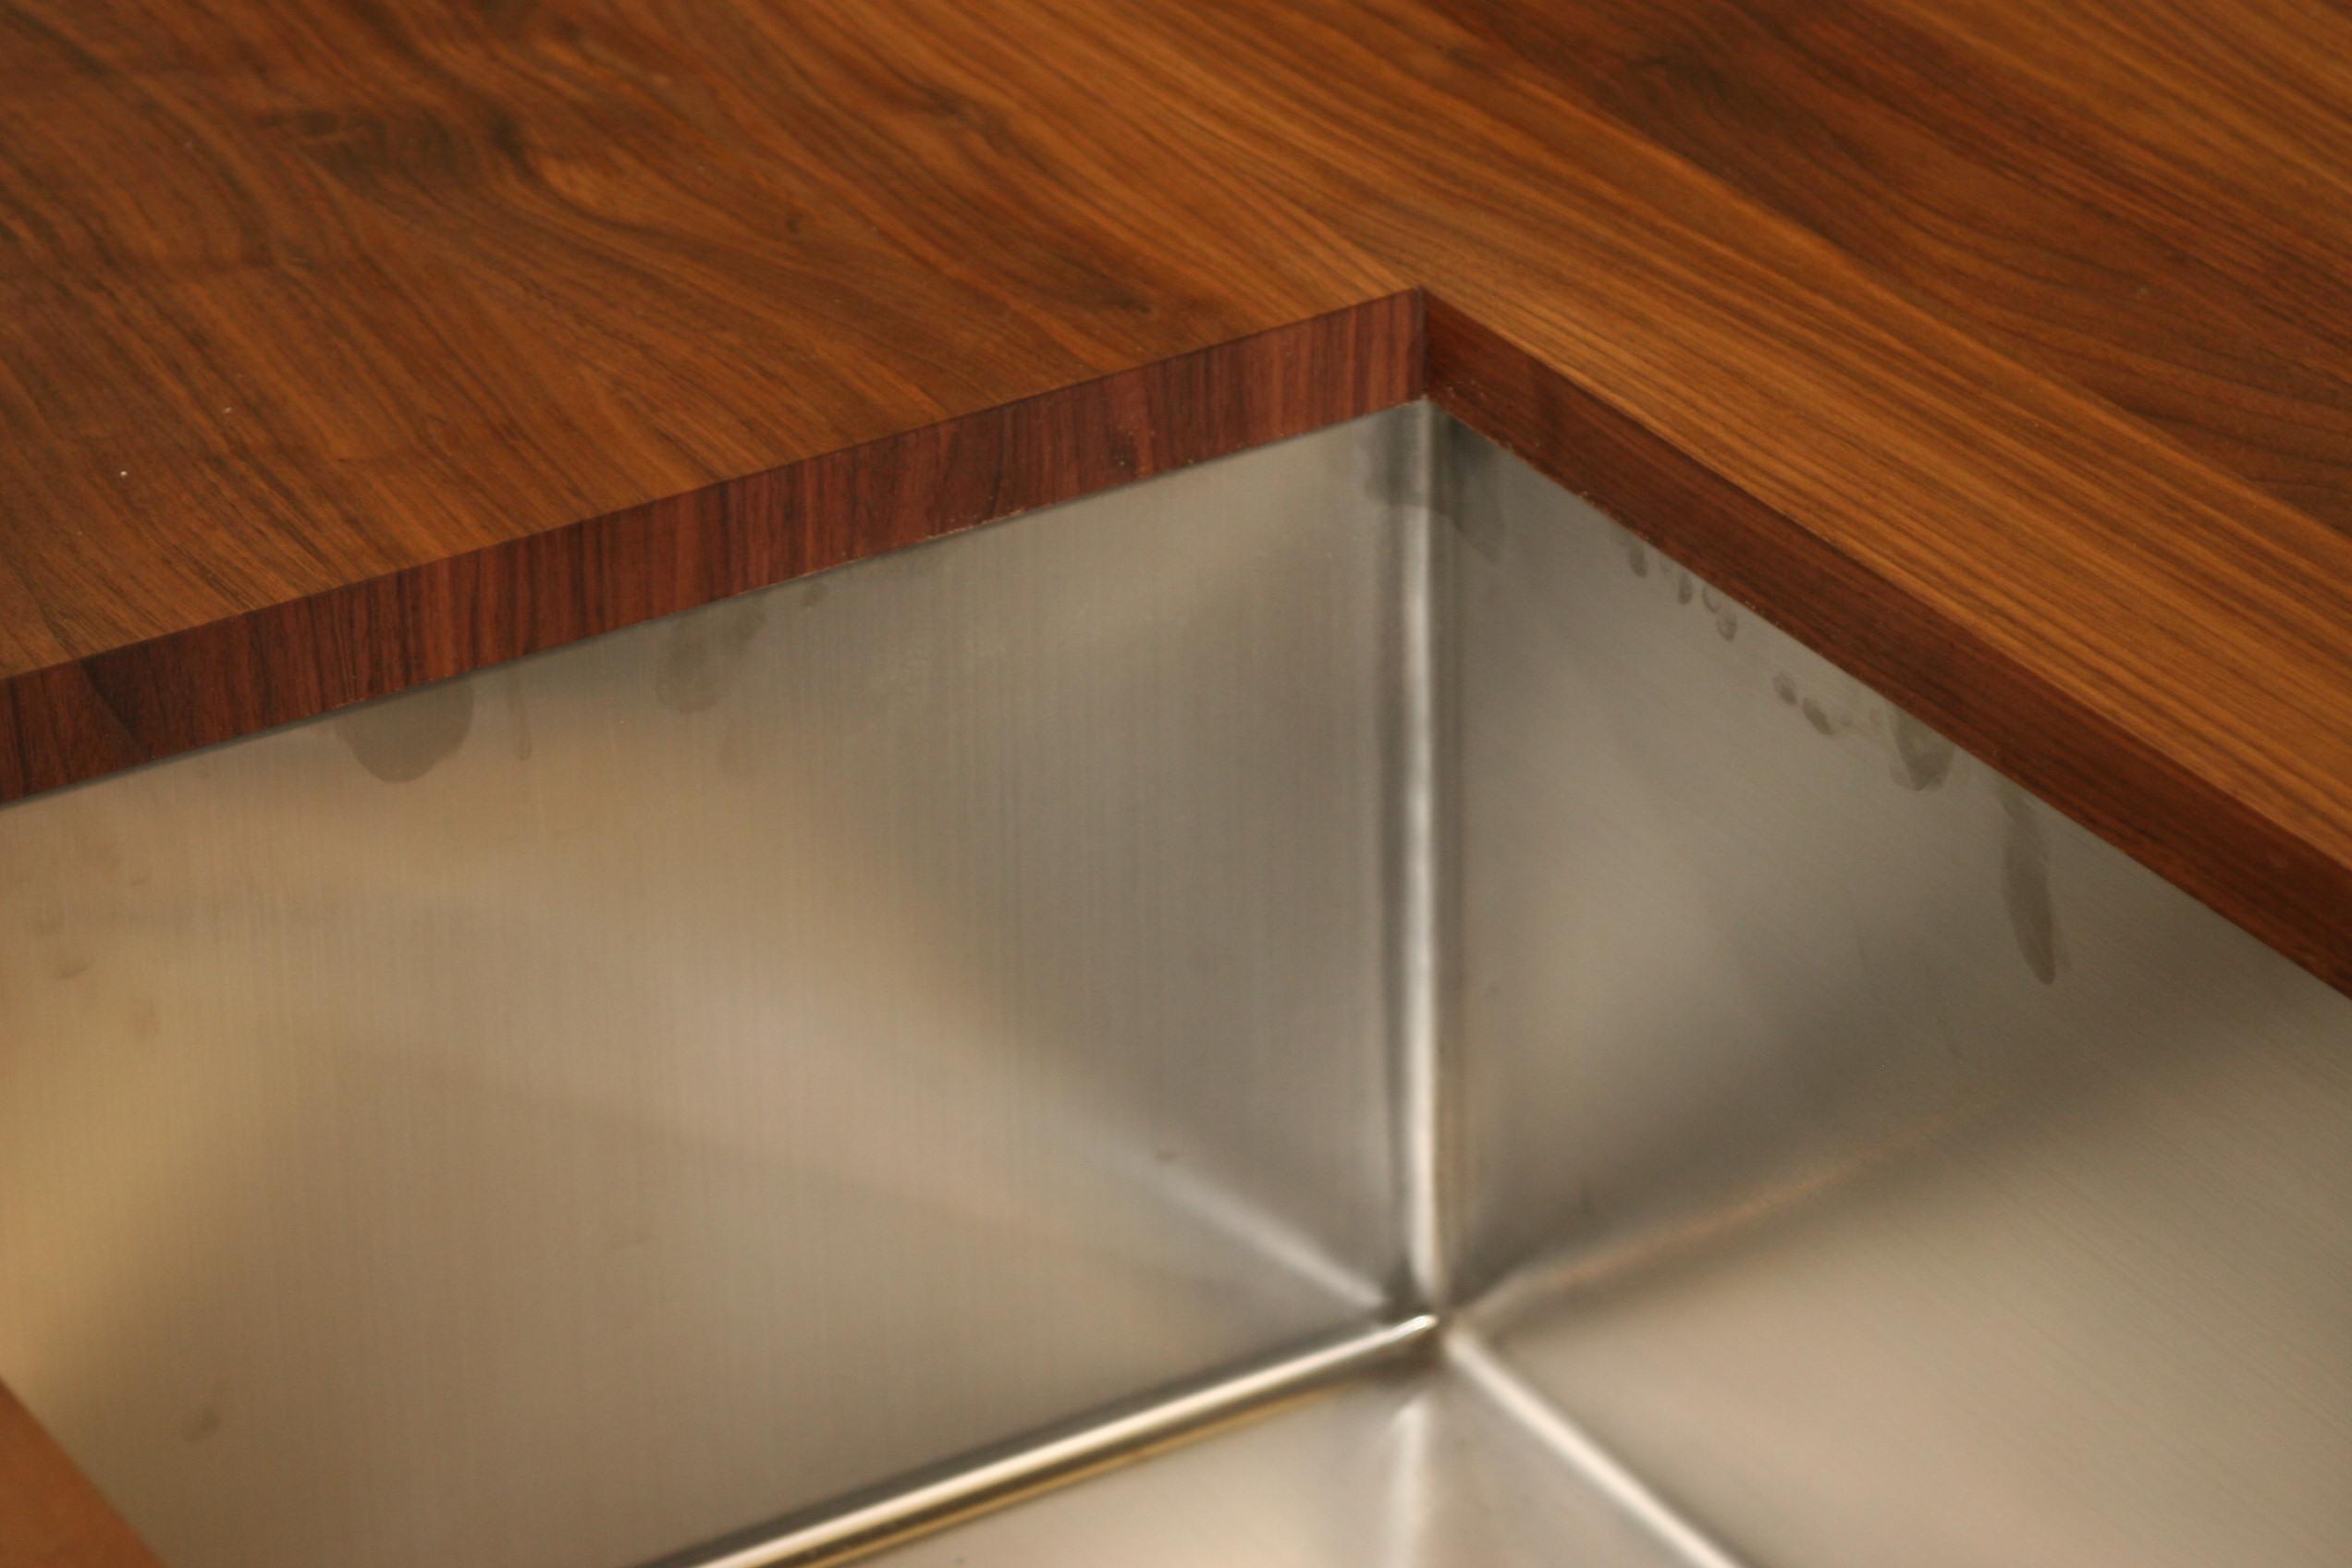 cobarto butcher island wood countertop counter top countertops mesquite bar cheap custom tops block